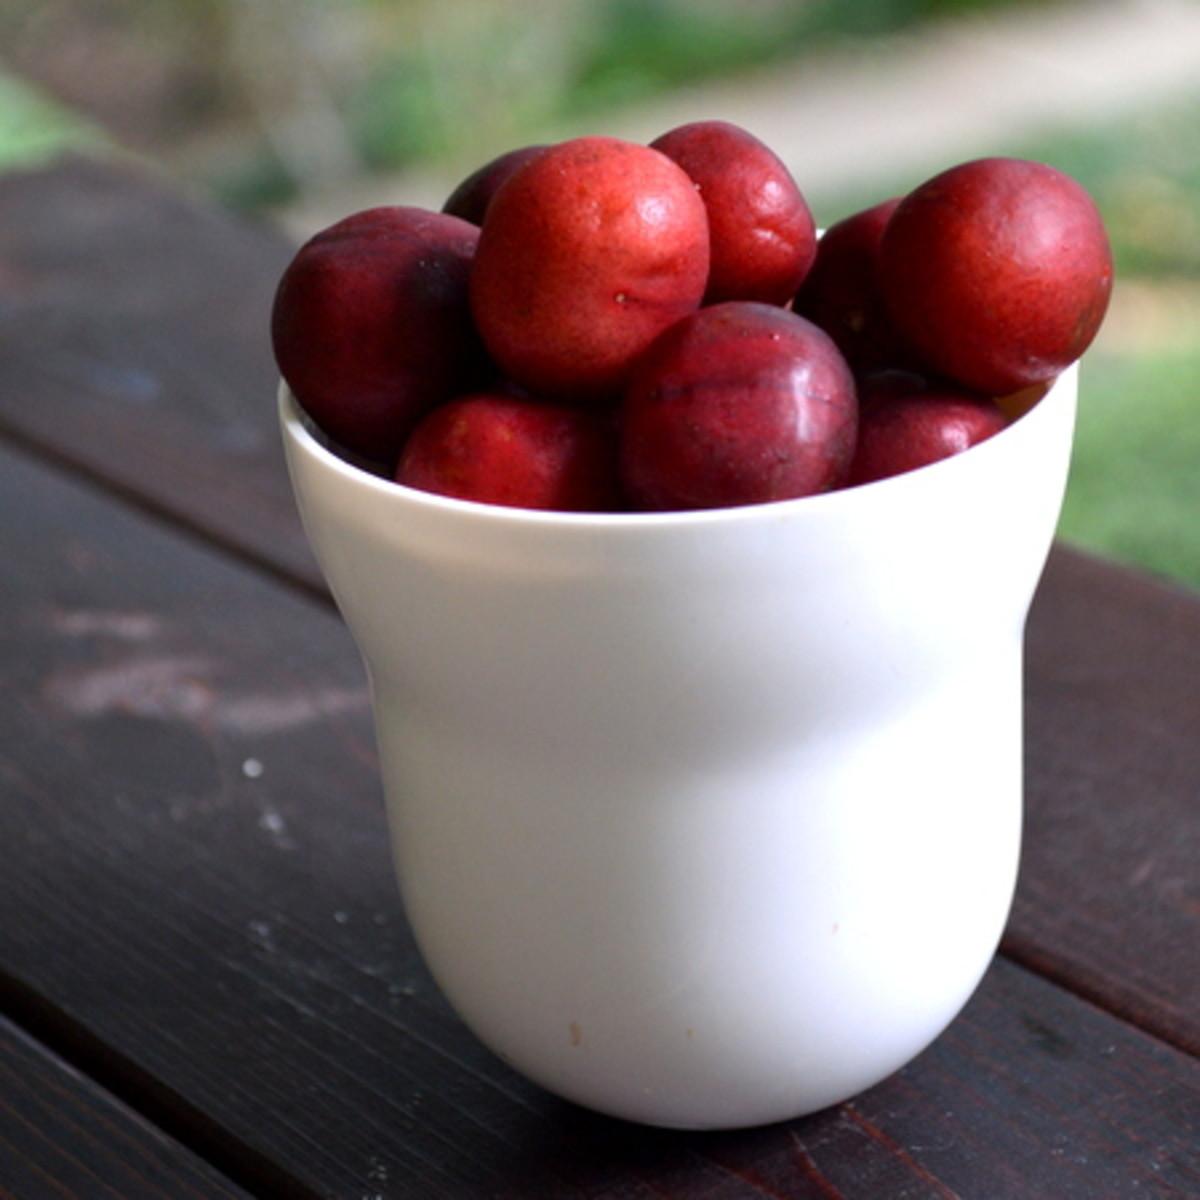 Eating plenty of fruit can help stave off jet lag.